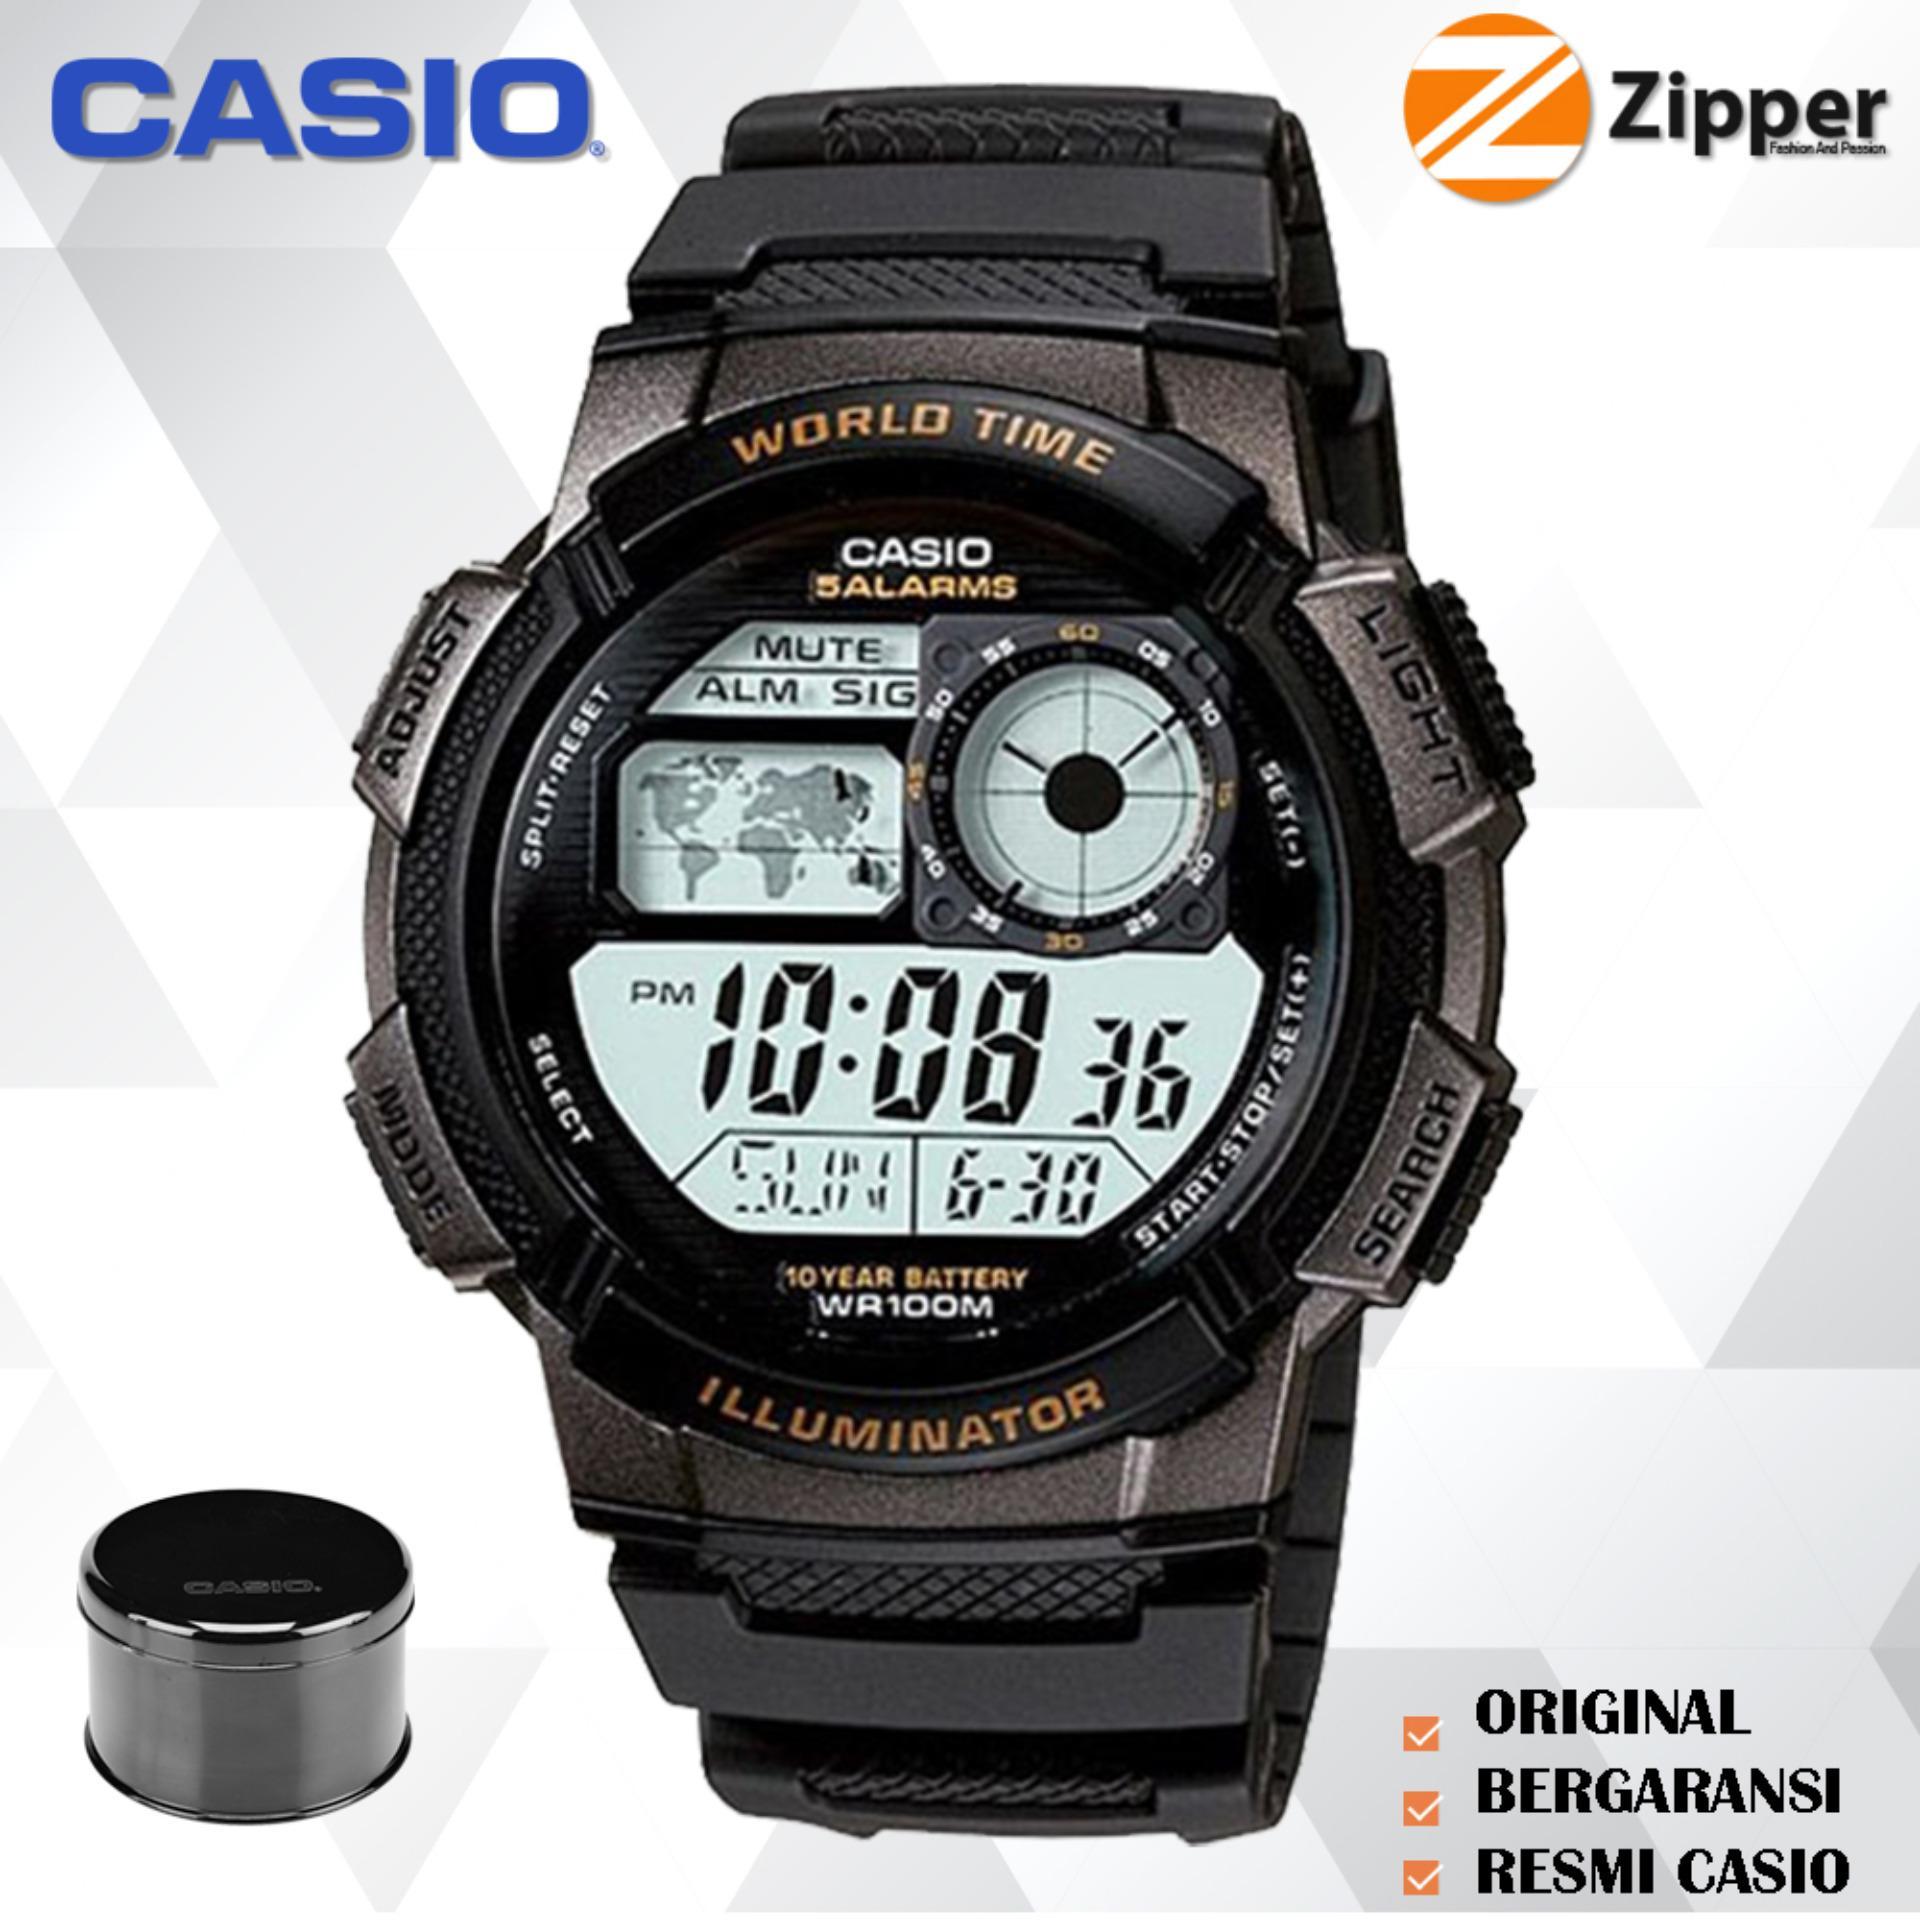 Casio Illuminator Jam Tangan Digital AE-1000W-1AVDF Youth Series - Tali Karet